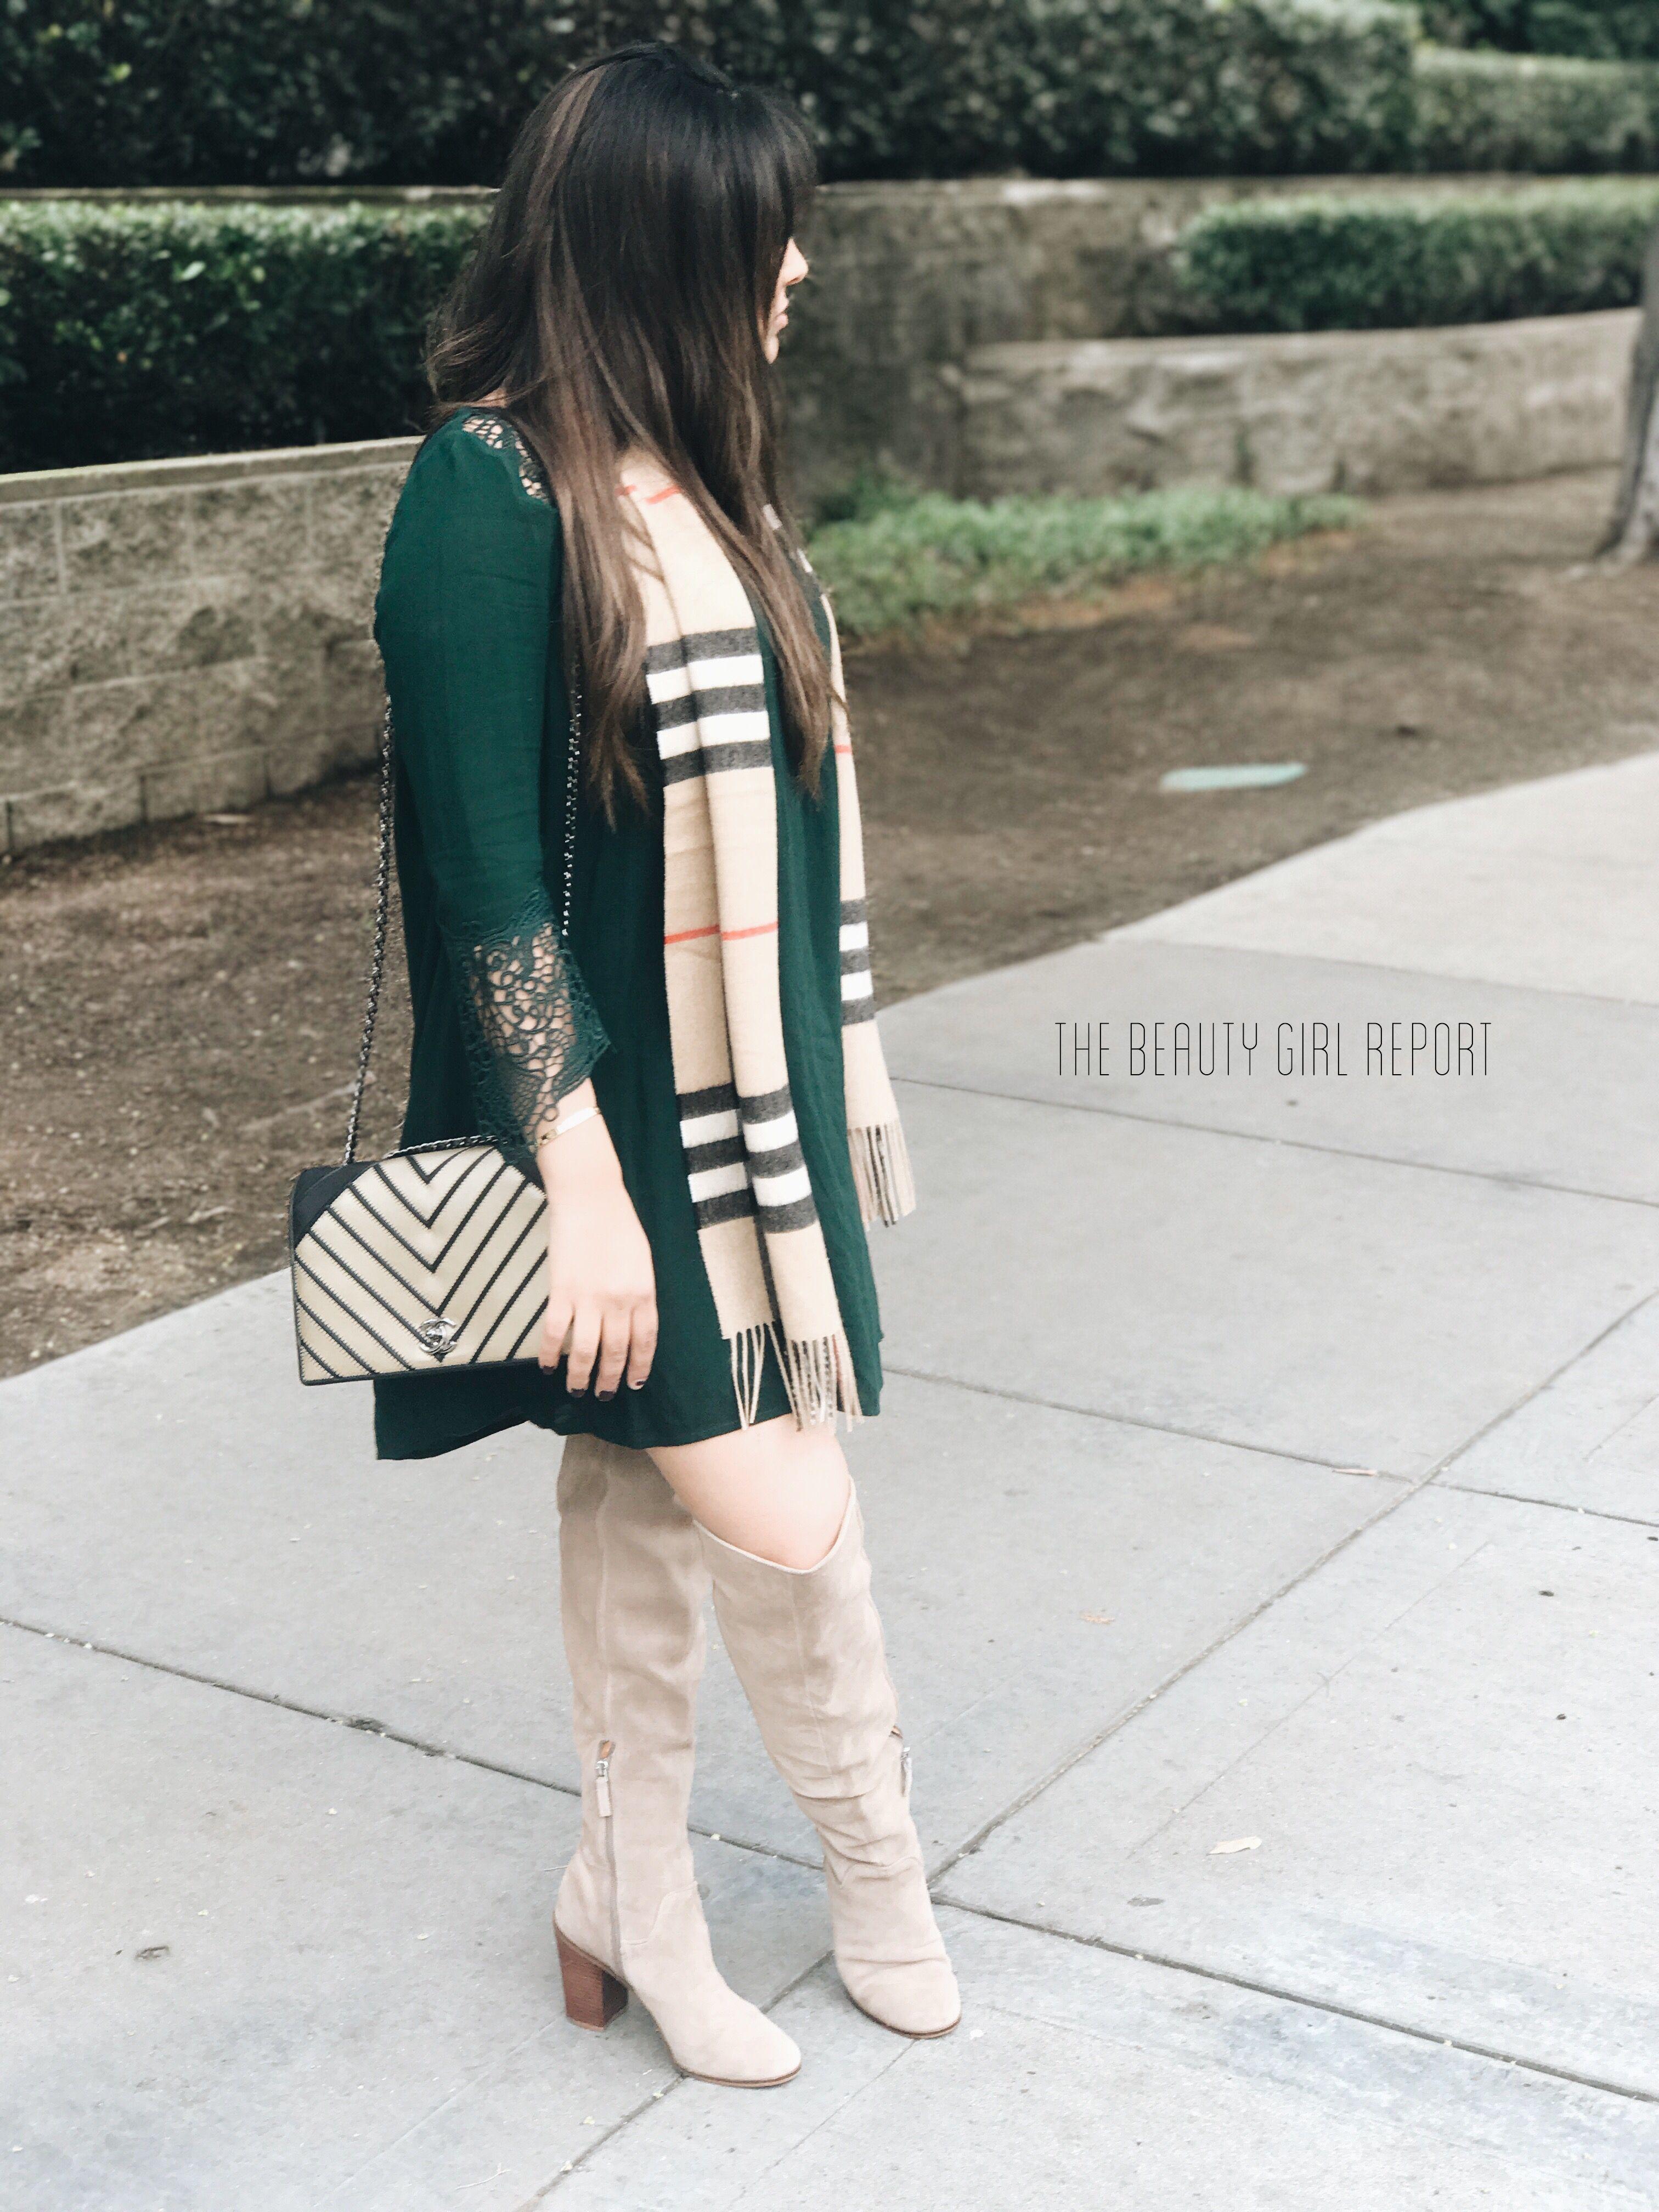 850bb85e673 DRESS. BB Dakota SCARF. Burberry PURSE. Chanel BOOTS. Franco Sarto ...